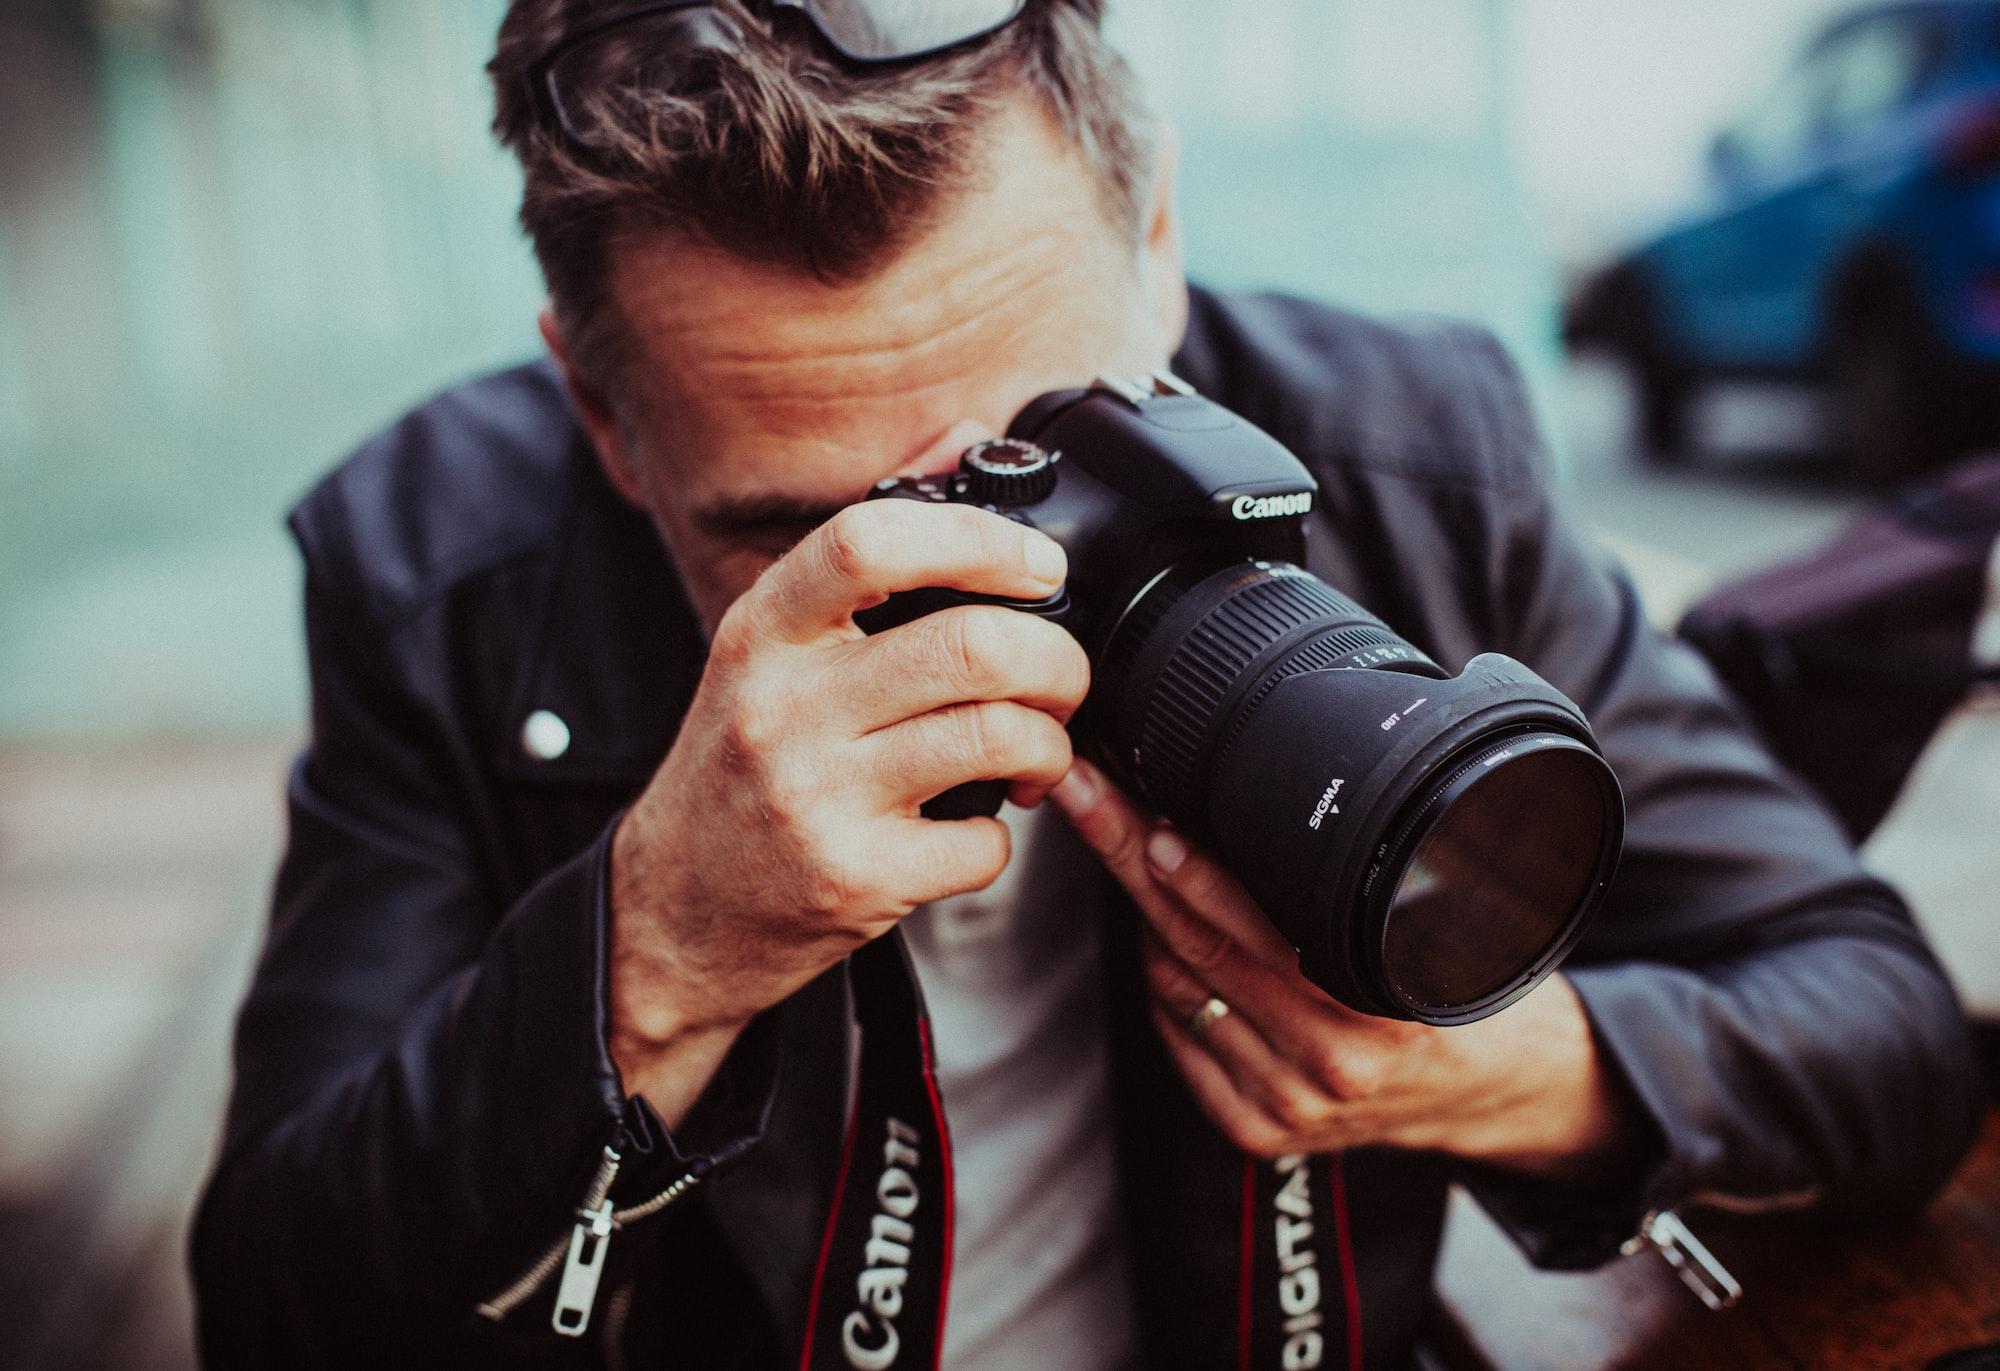 Building the habit of Capturing